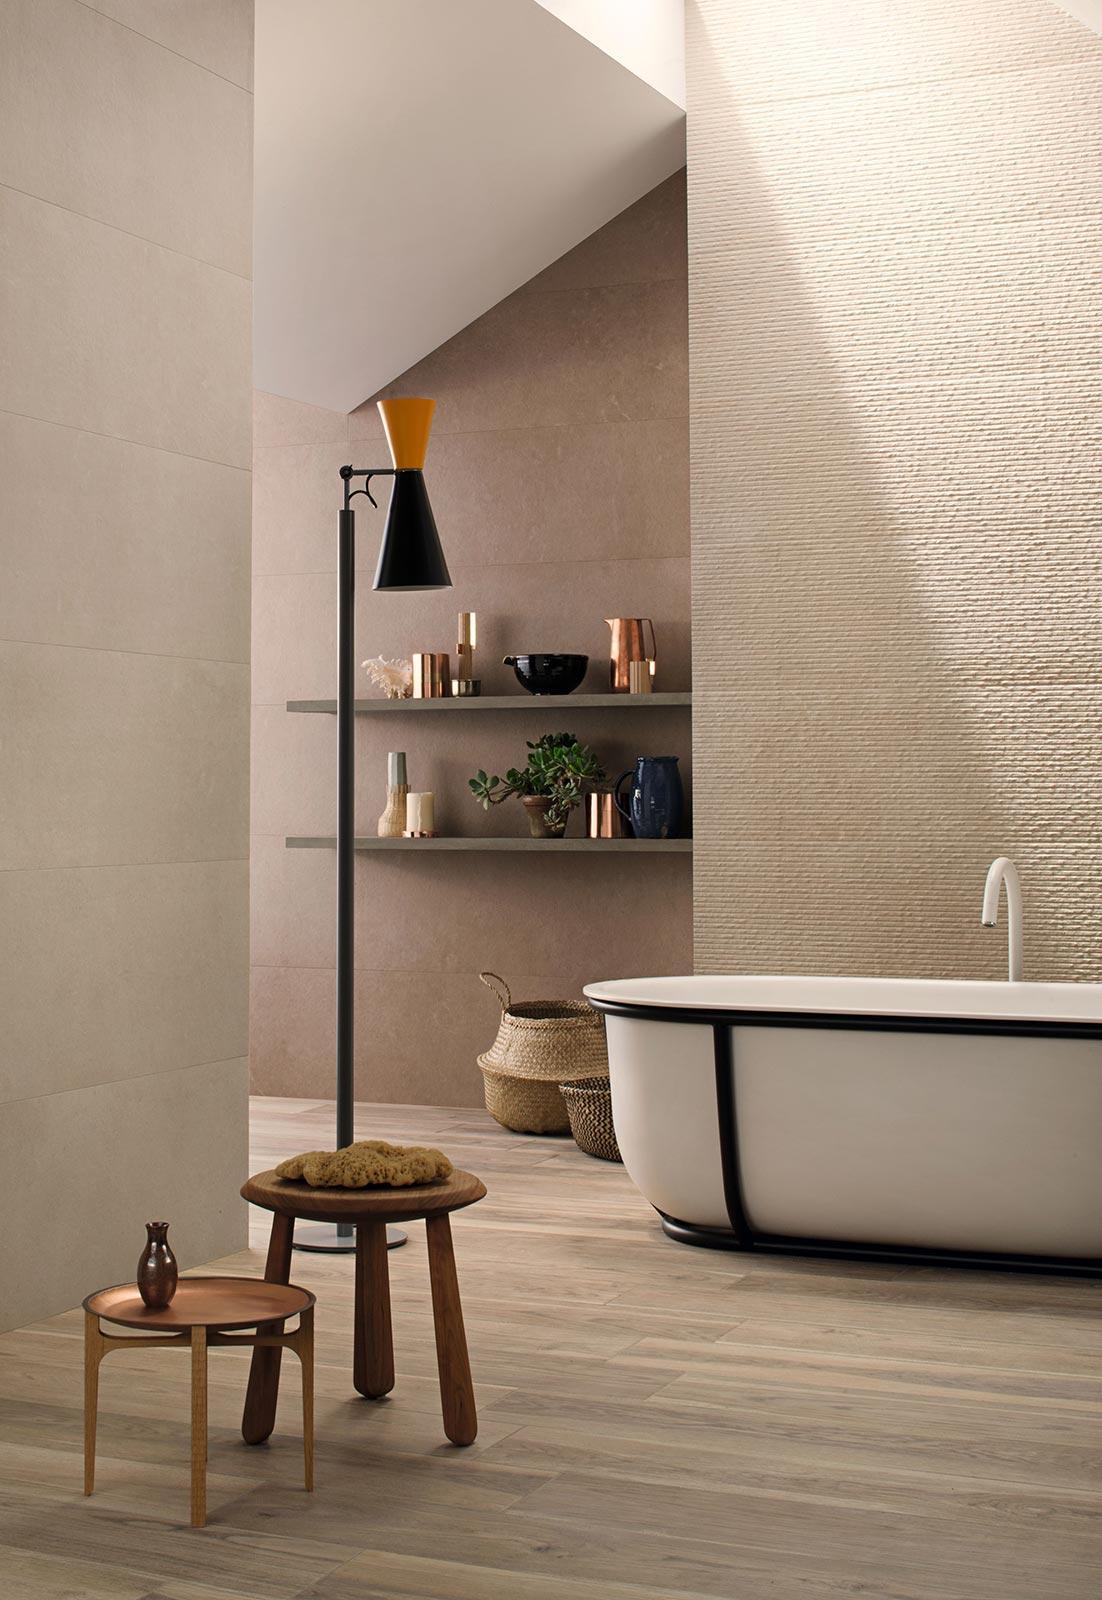 Stone Art Effect Bathroom